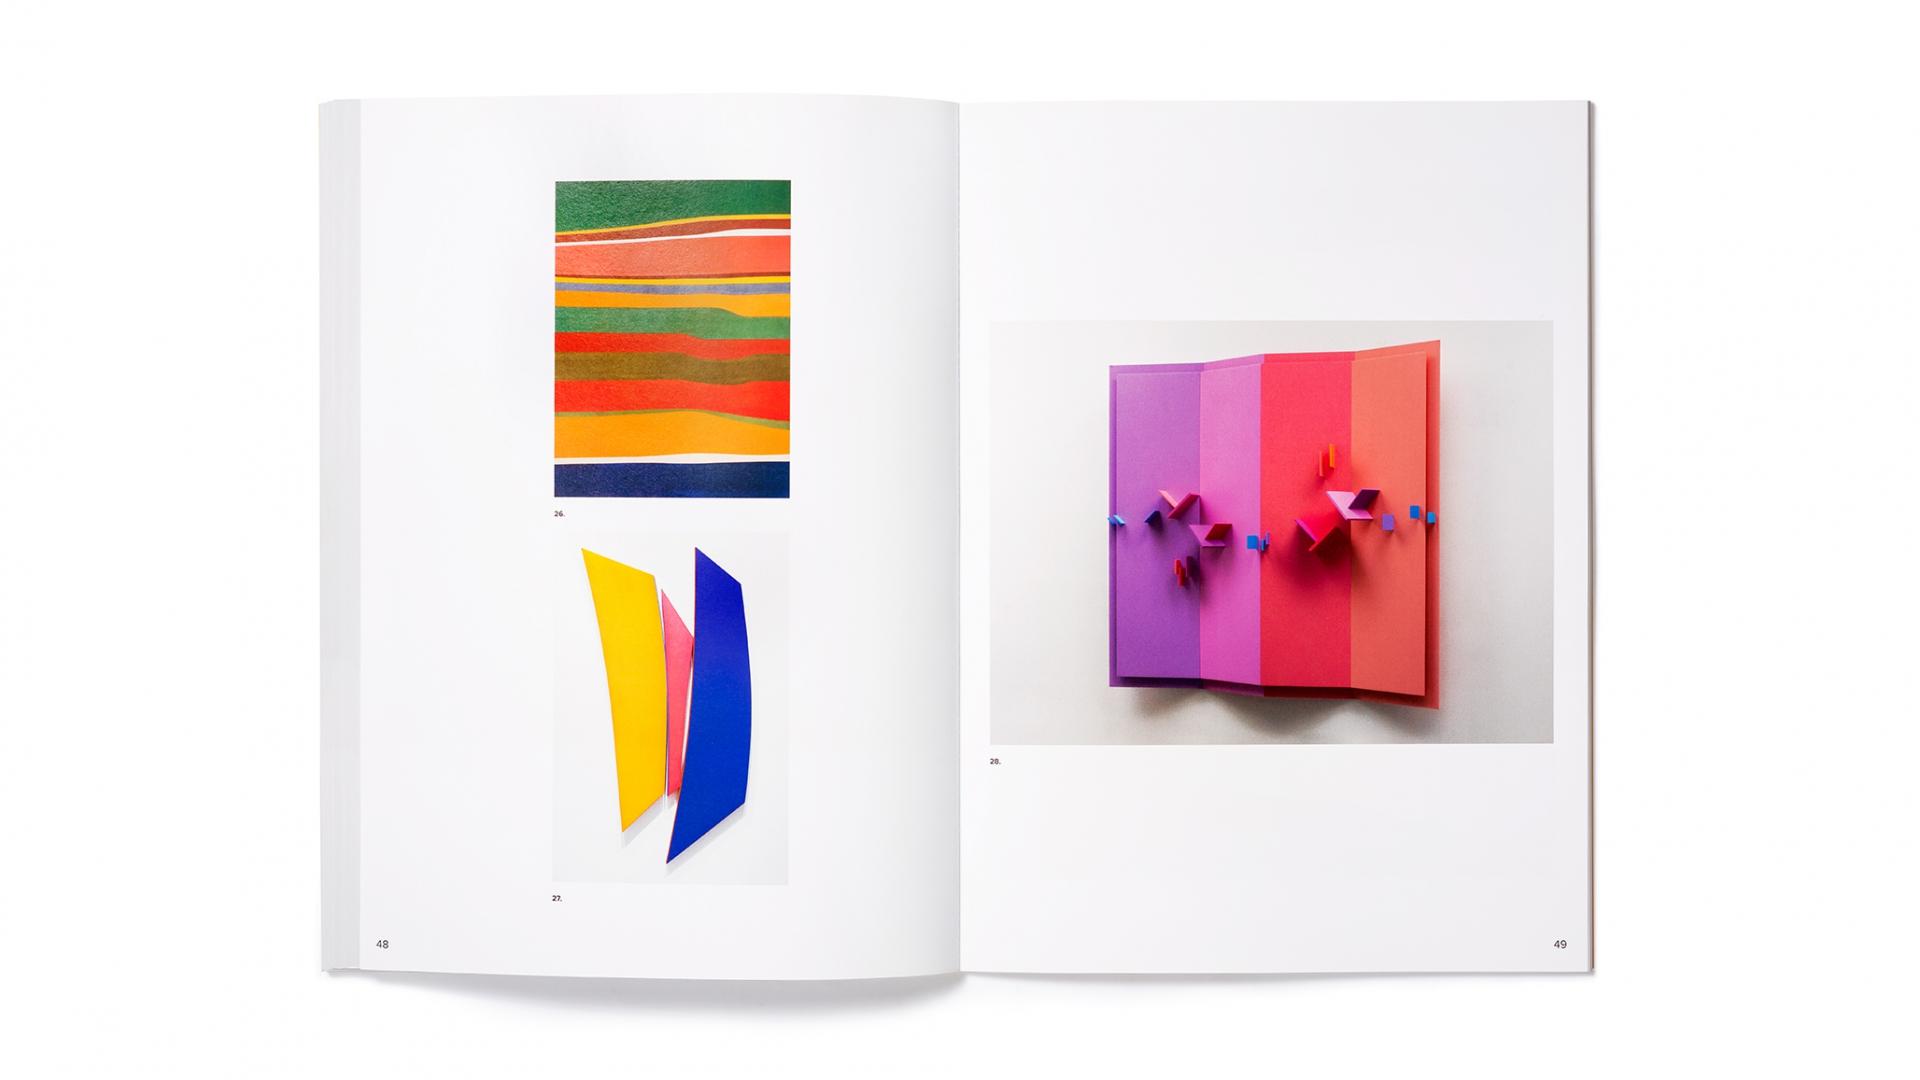 20180618-rm-book-spreads-8-1920x1080.jpg